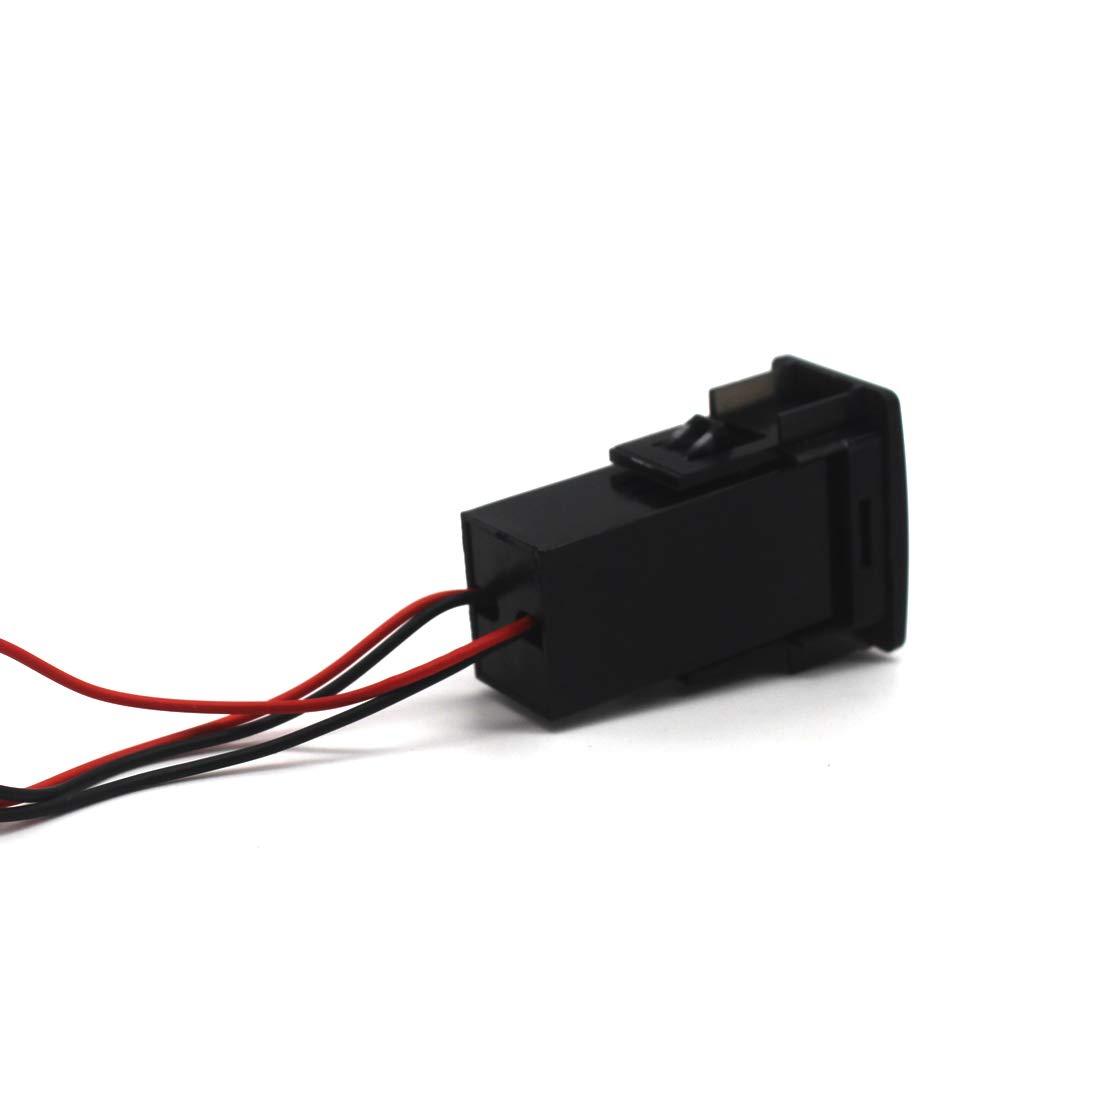 2.1A Dual USB Power Socket Port For iPhone 8 7 6 5,Samsung Huawei,LG,MP3 And More 4351609002 3724mm MOTONG HONDA Dual USB Socket